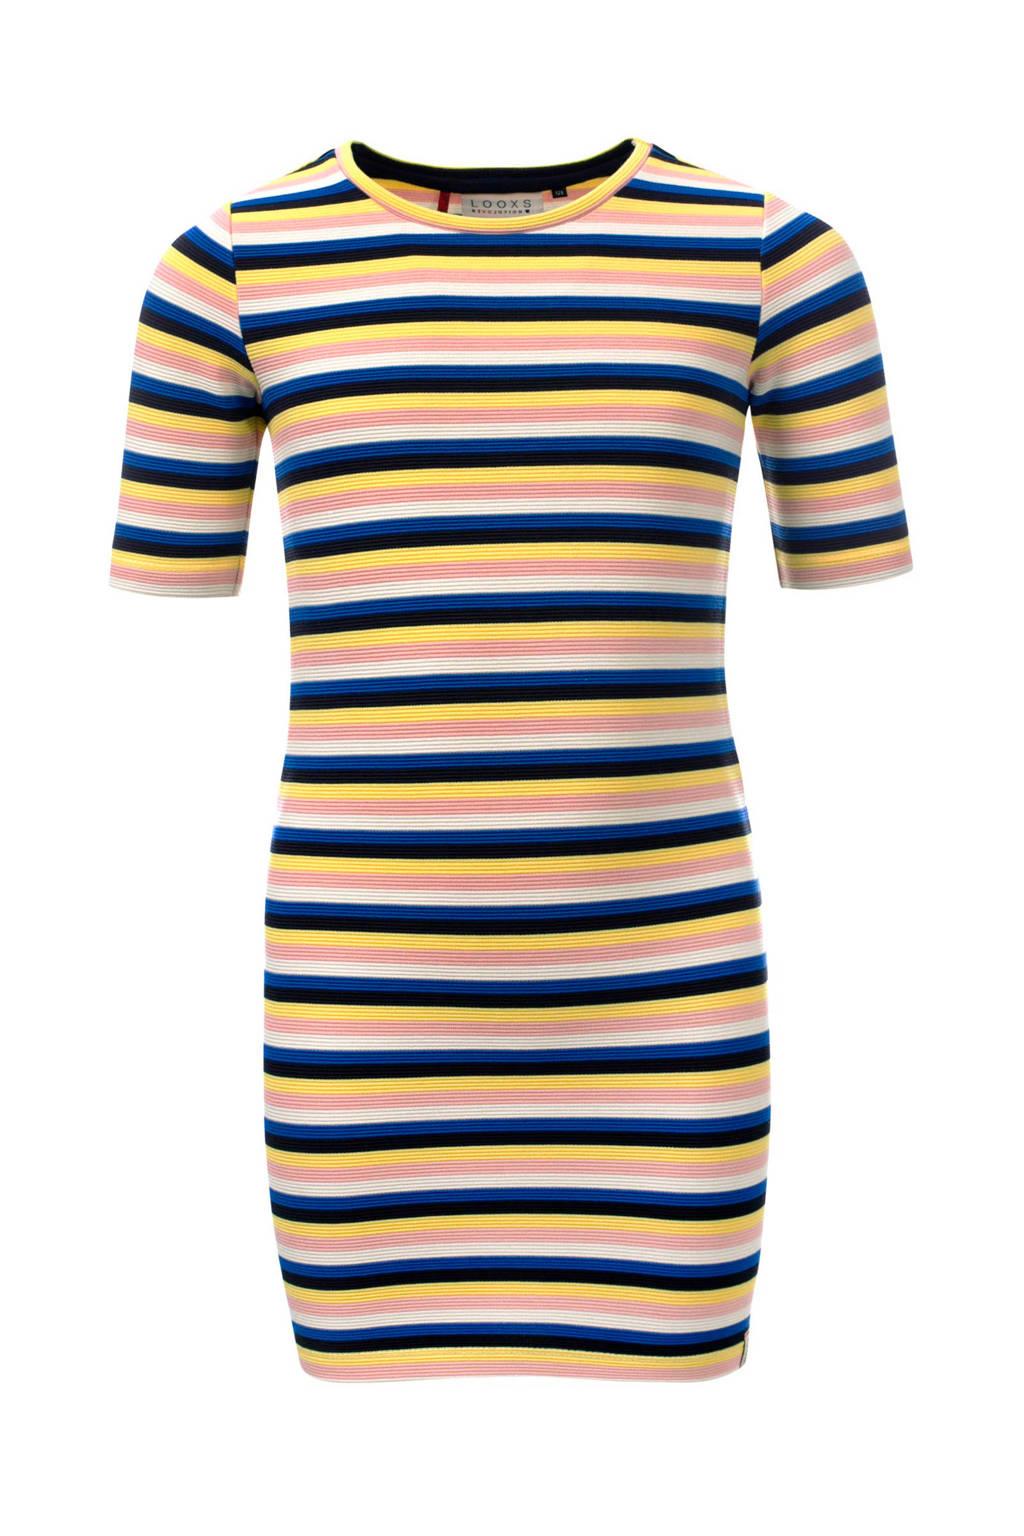 LOOXS gestreepte jurk multi colour, Geel/ multi colour